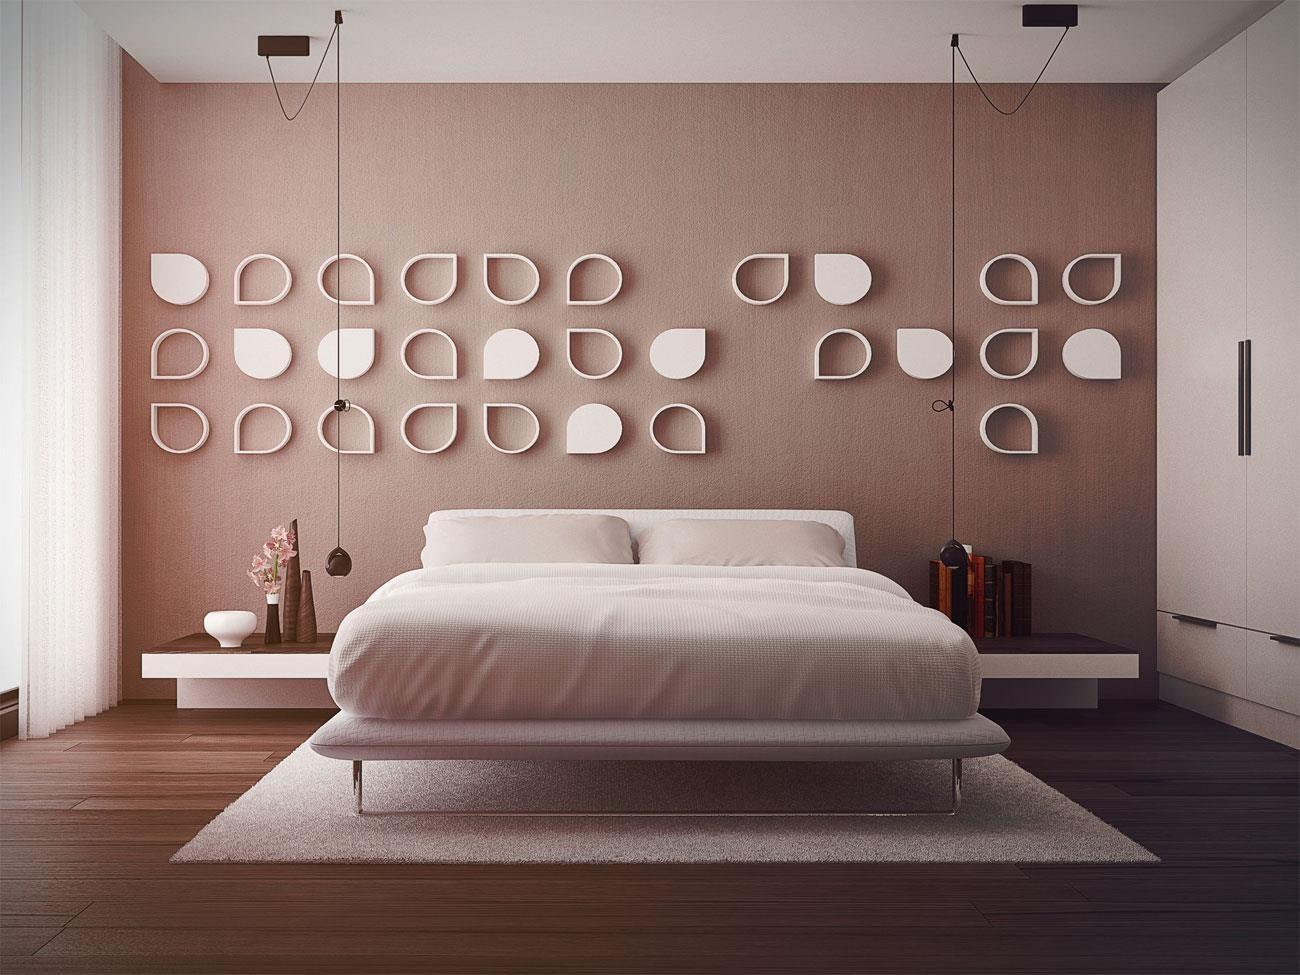 Pin by ives de leon on diseño de interiores u arquitectura pinterest